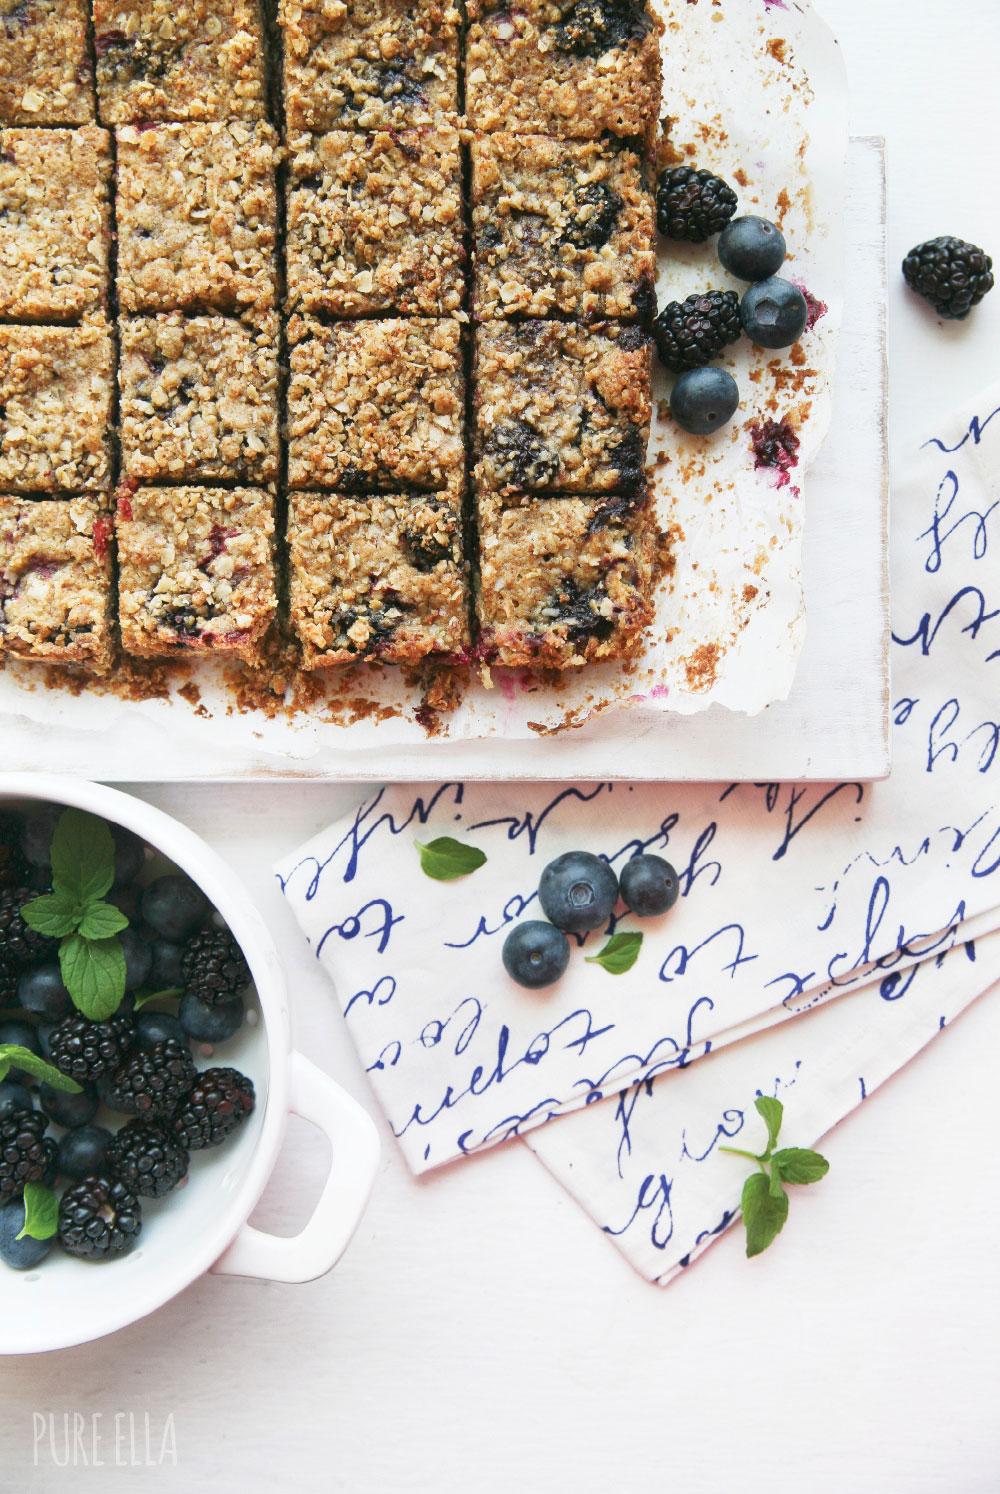 Pure-Ella-gluten-free-vegan-blueberry-blackberry-crumb-squares6